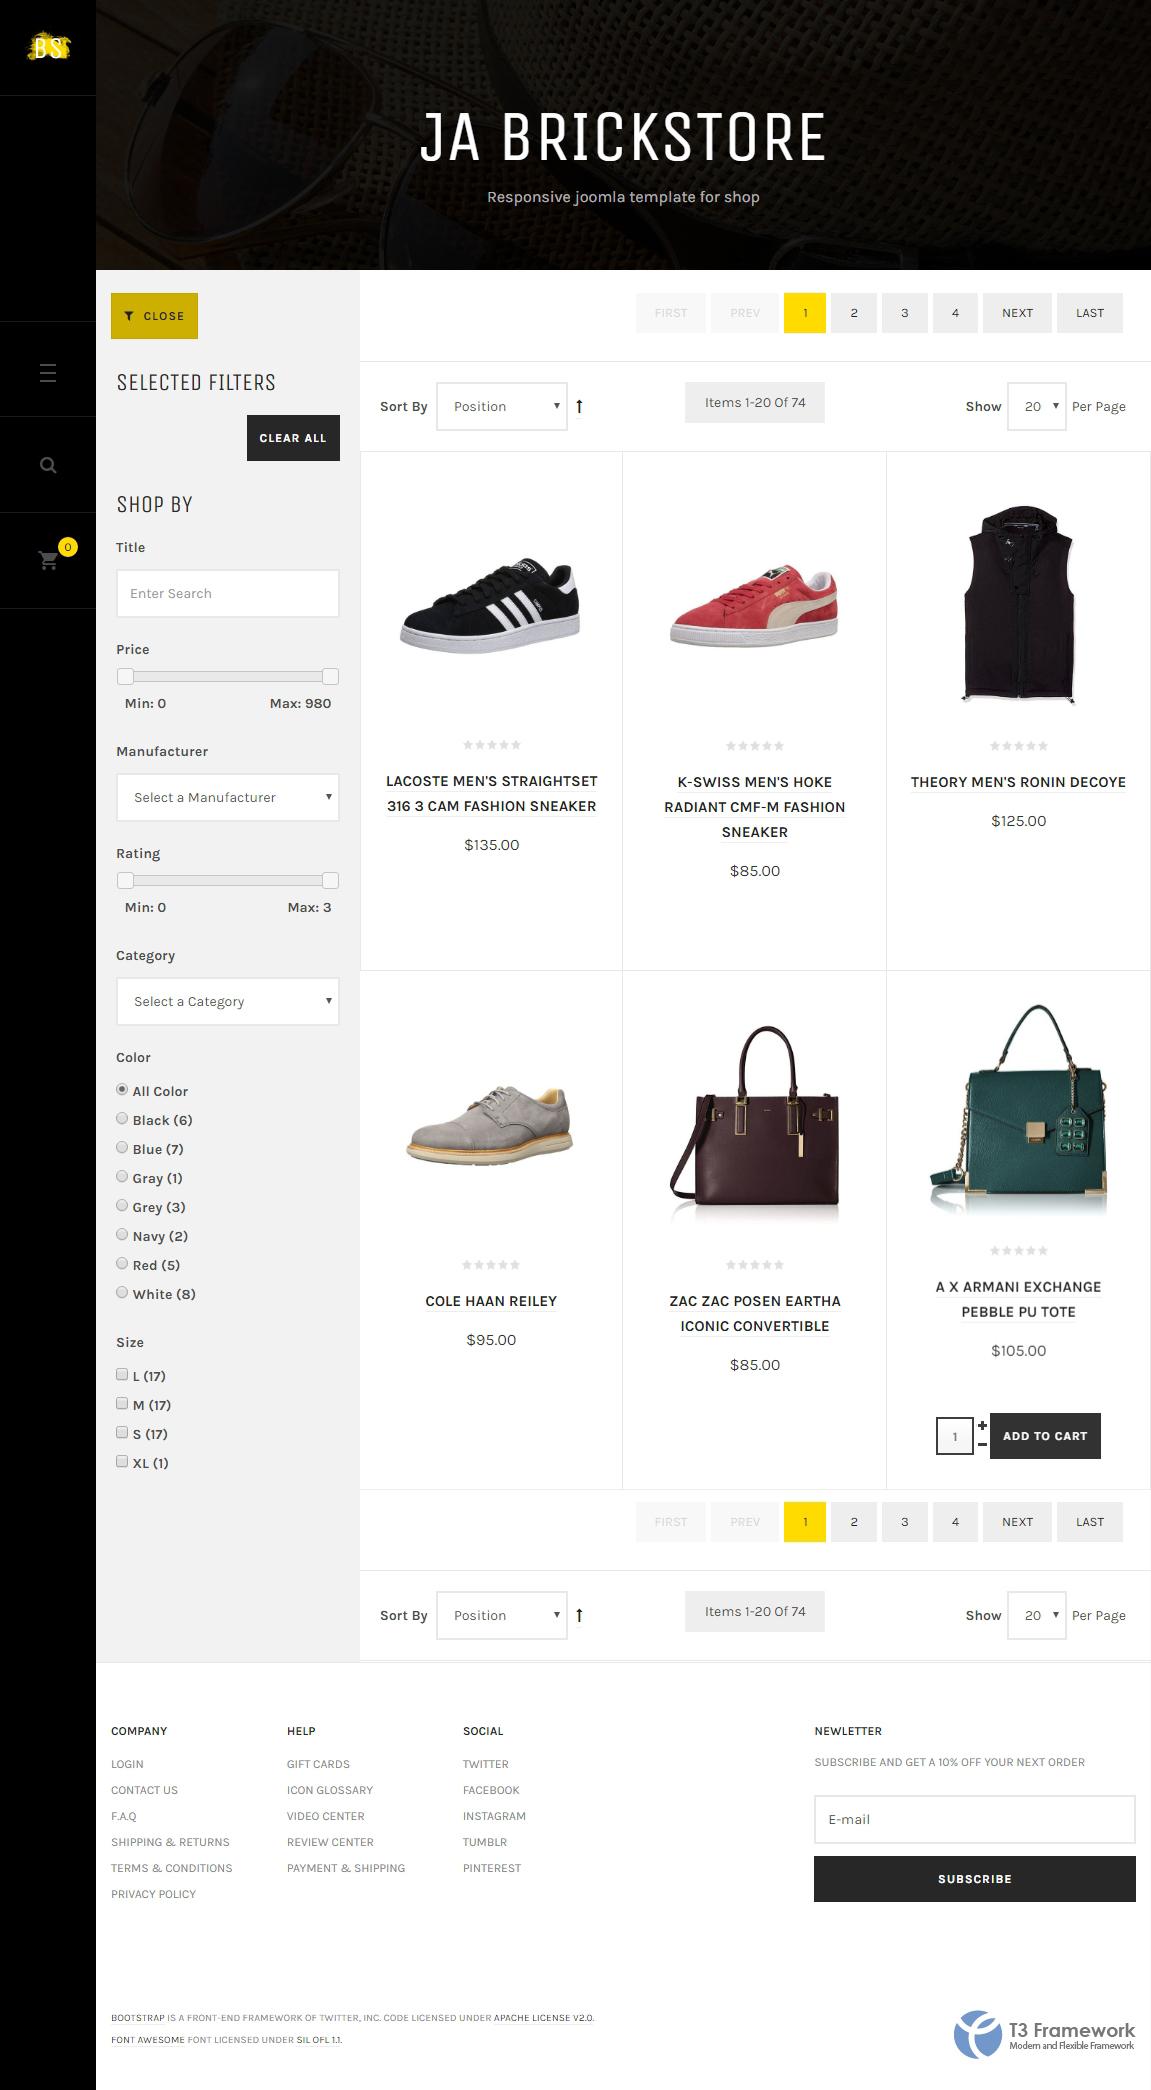 ja decor responsive joomla template preview ja brickstore responsive ecommerce joomla